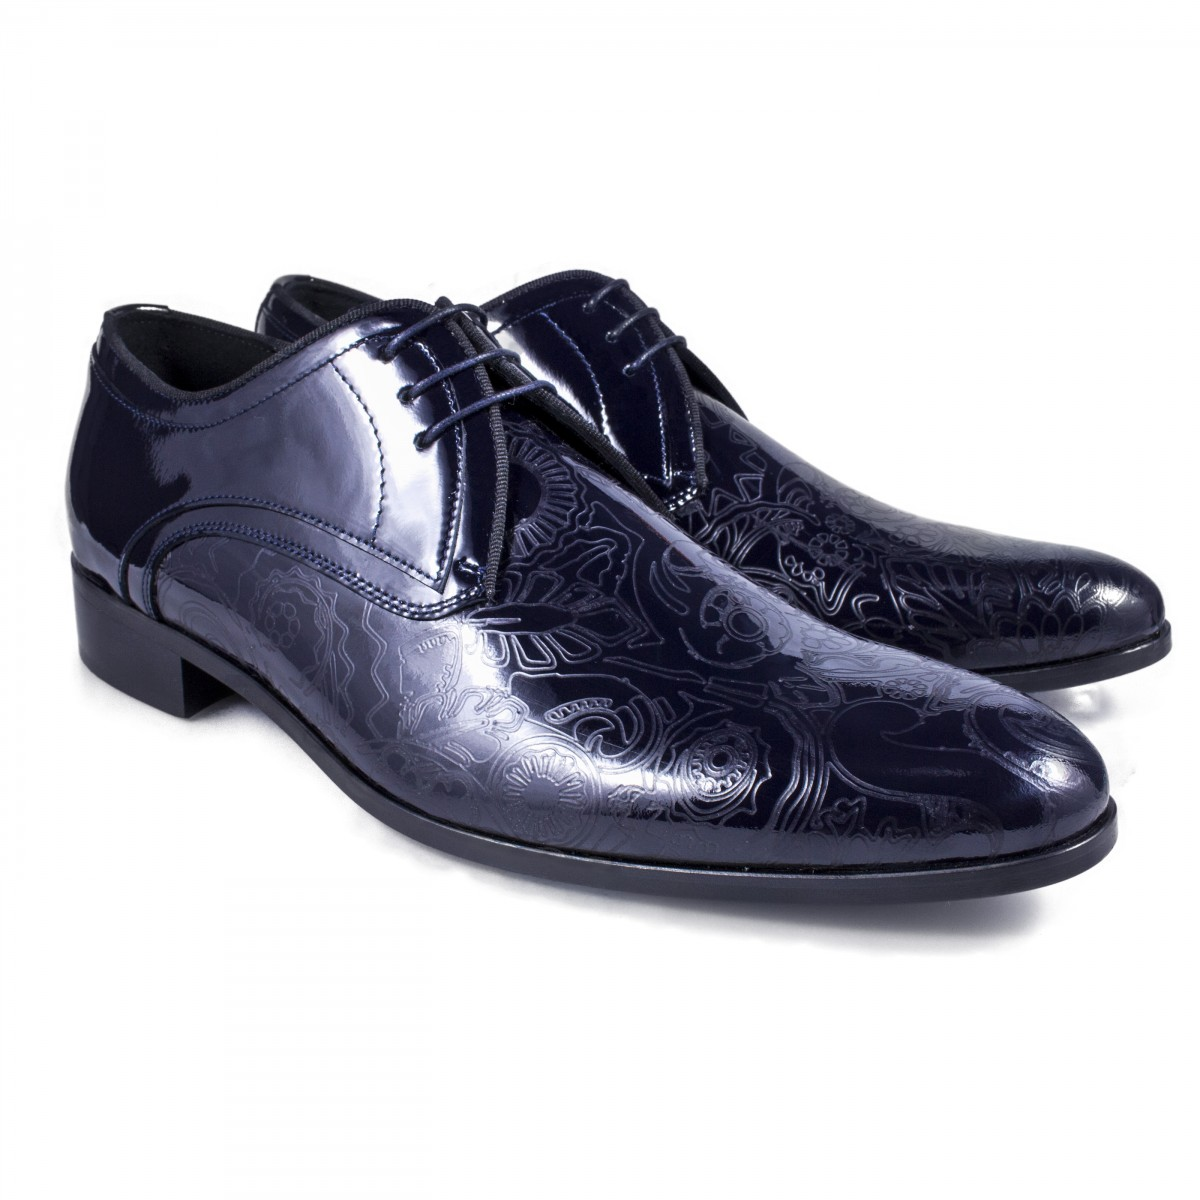 Scarpe Matrimonio Uomo Blu : Scarpe eleganti da uomo blu cerimonia sposo